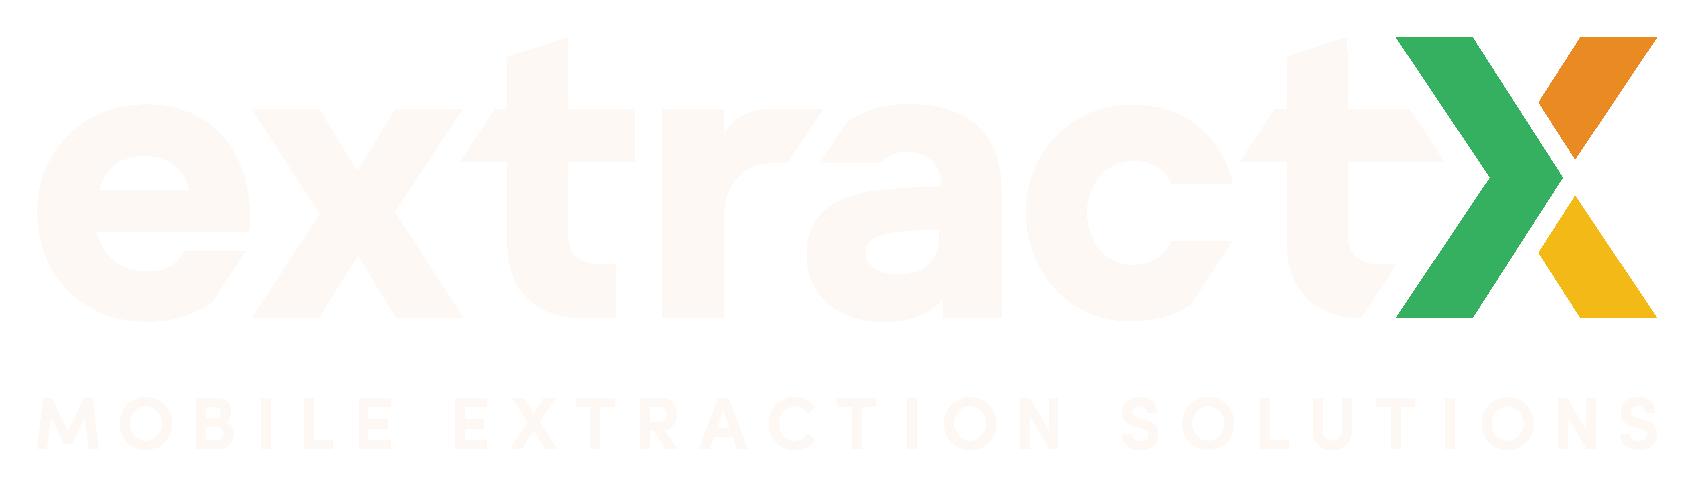 extractX Logo